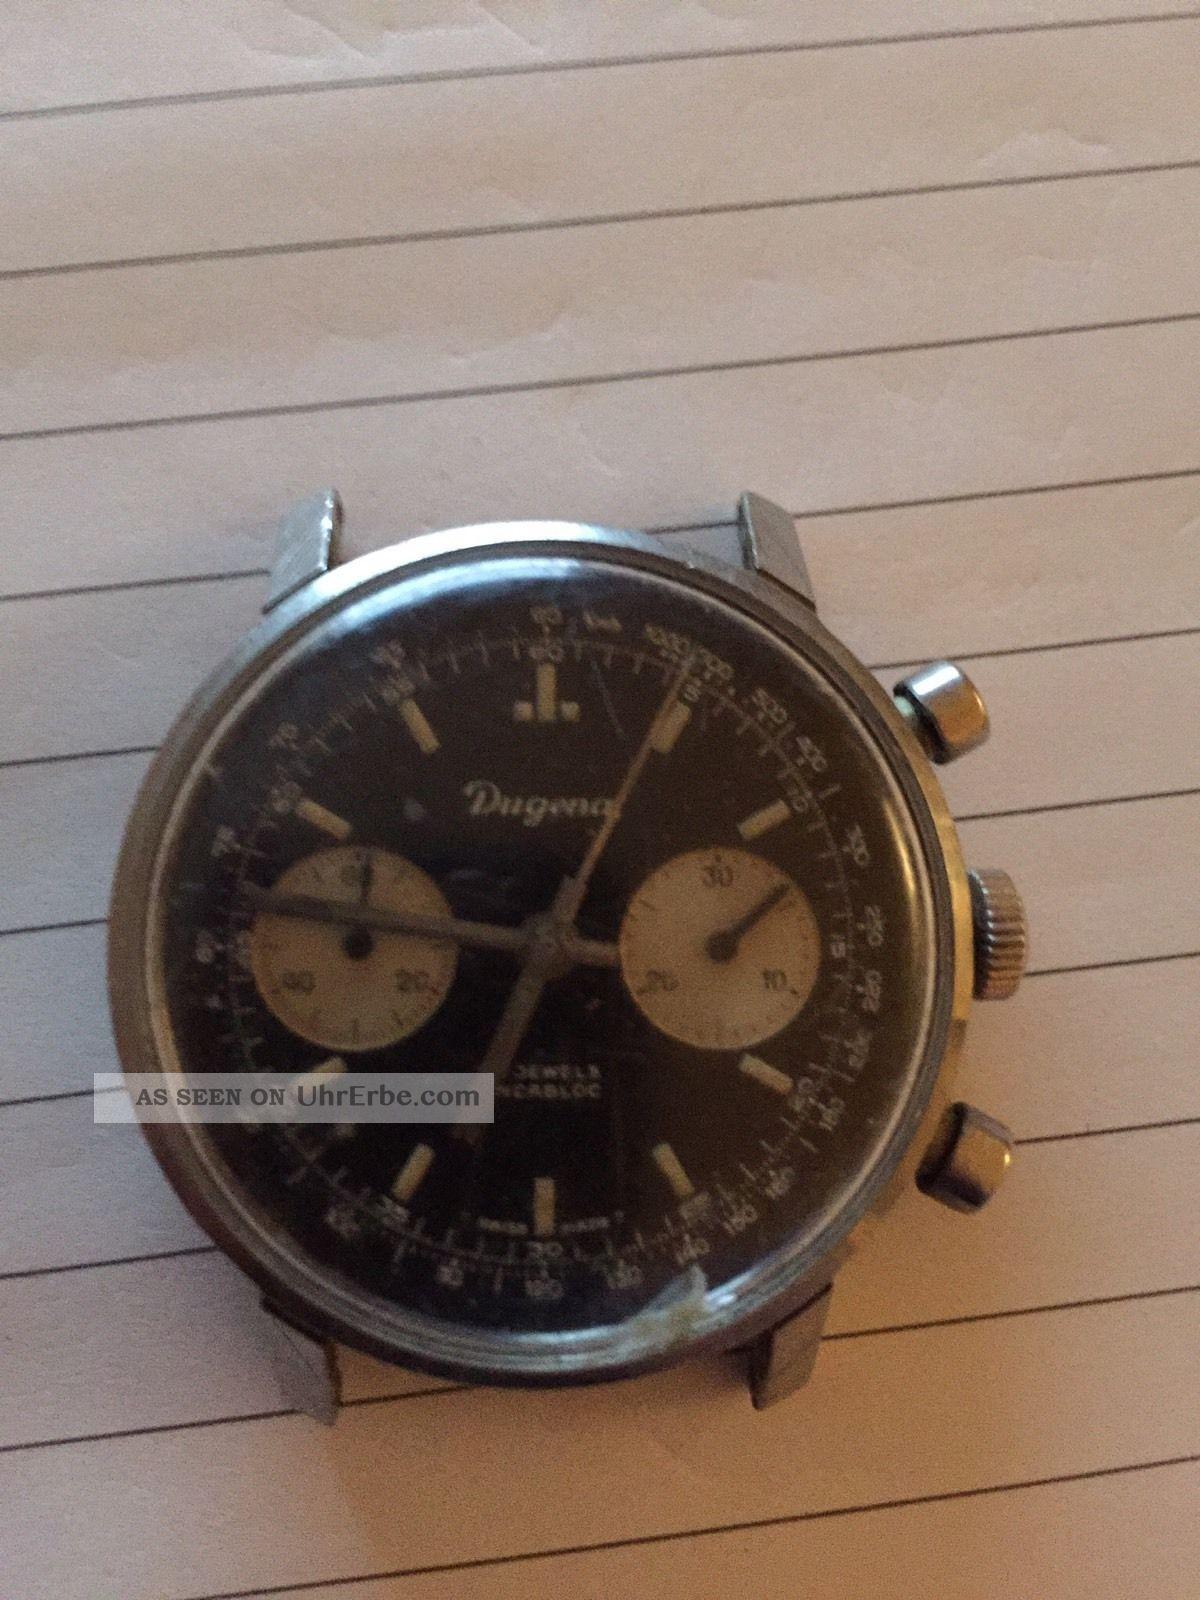 Dugena Chronograph Armbanduhren Bild